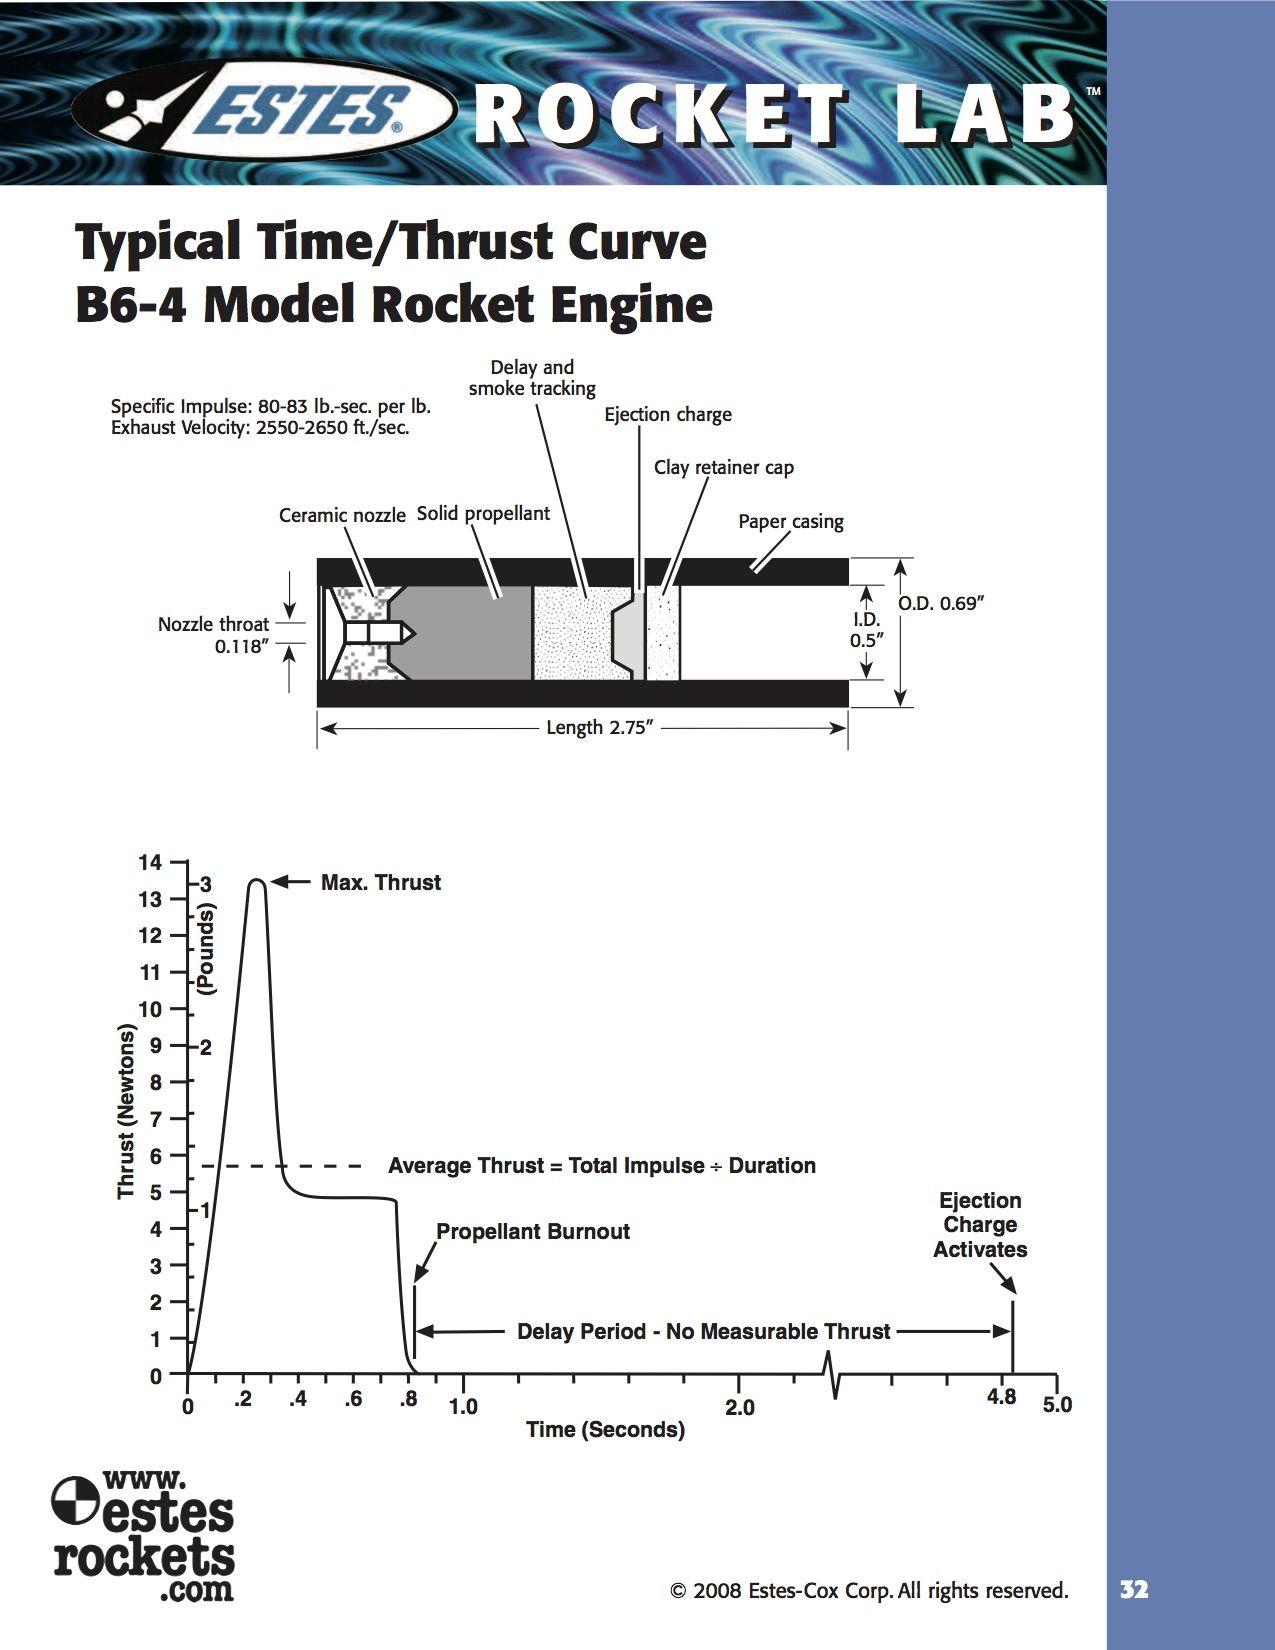 typical time thrust curve for a b6 4 model rocket engine specific impulse 80 83 lb sec per lb exhaust velocity 2550 2650 ft sec  [ 1275 x 1650 Pixel ]